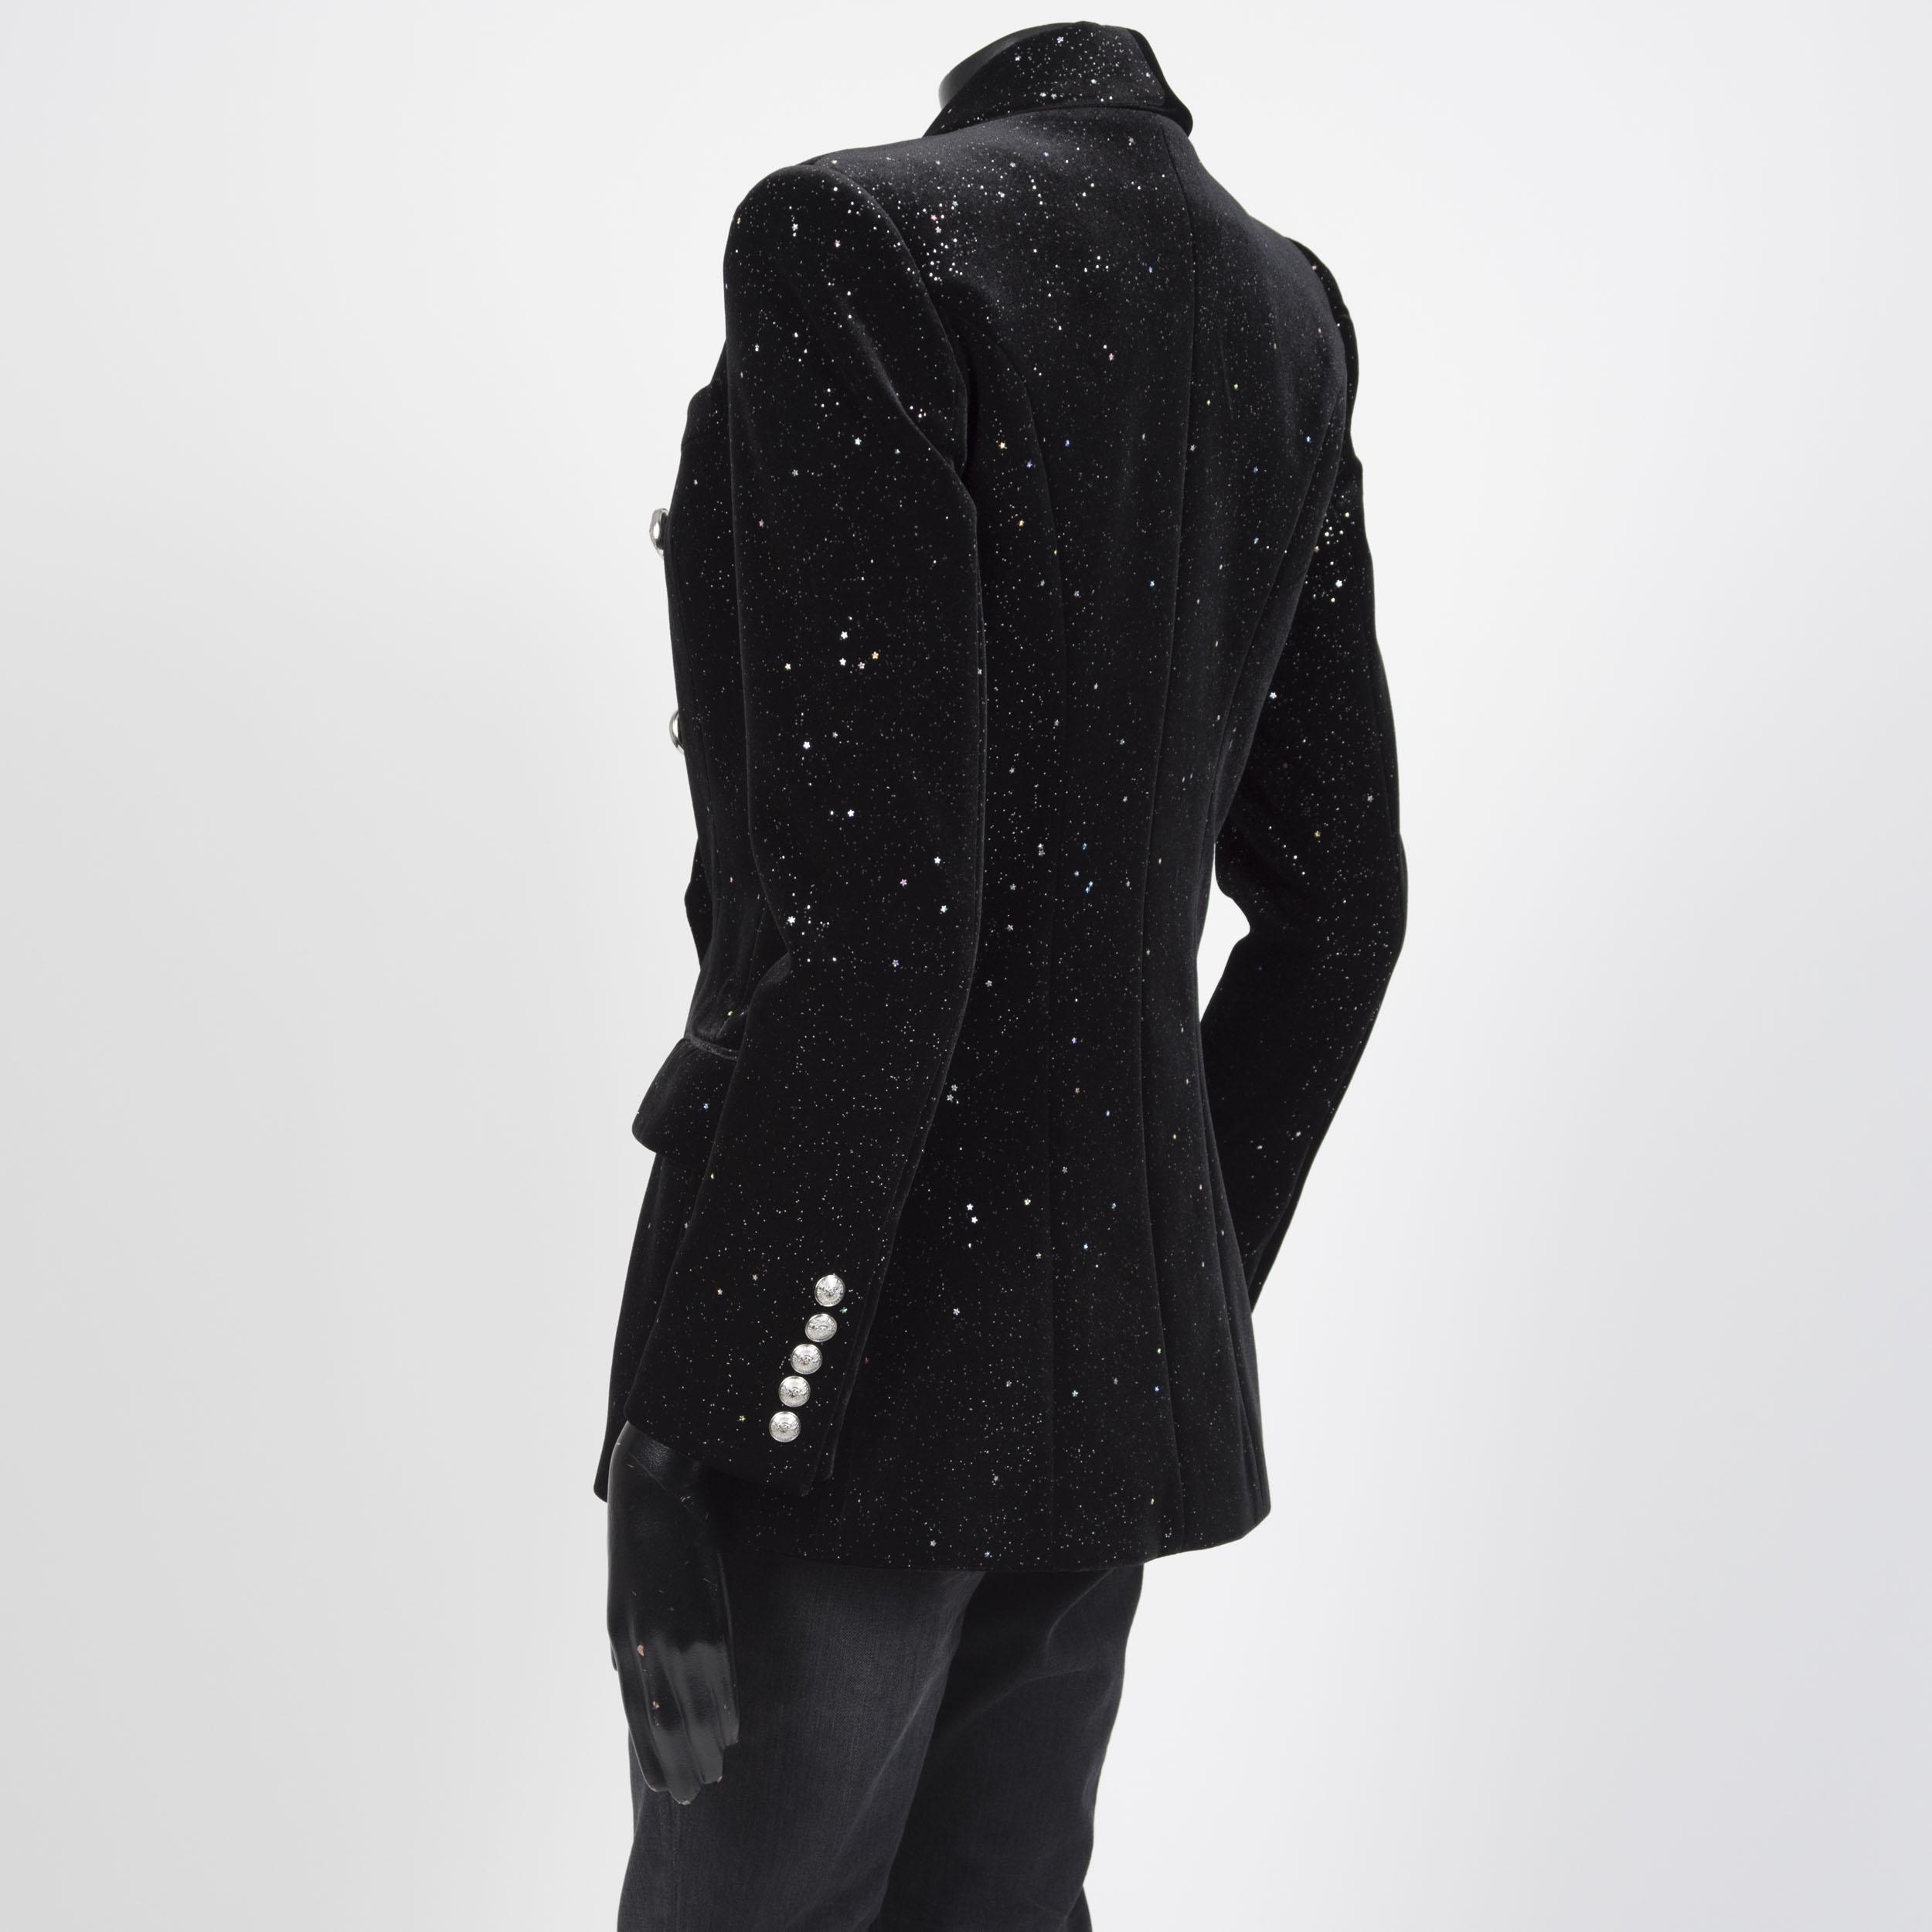 58f6a18b BALMAIN 2650$ Glitter Embellished Double Breasted Blazer In Black ...